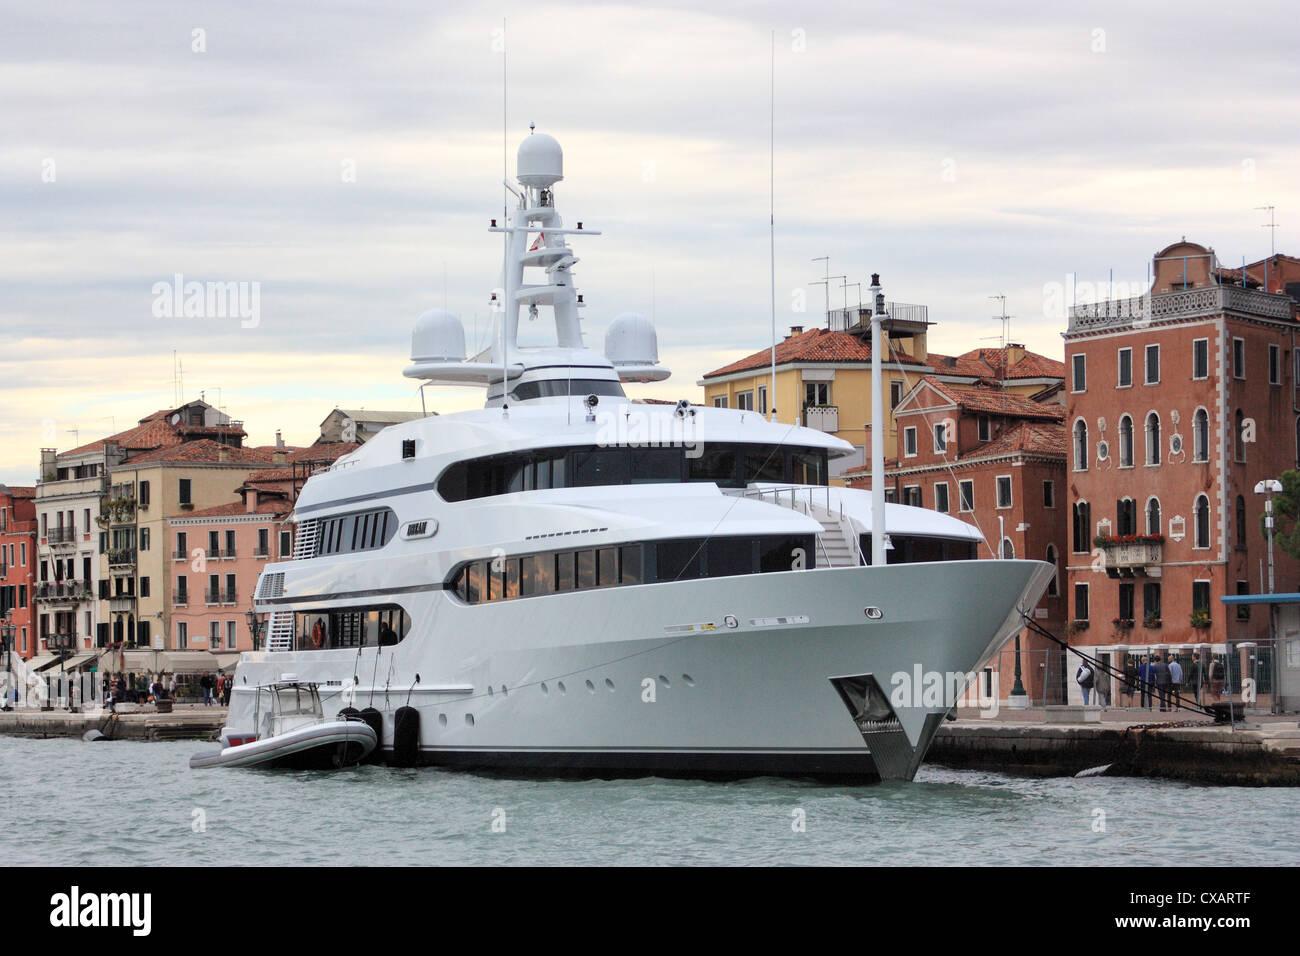 Yacht Dream, IMO 1007275 - Stock Image